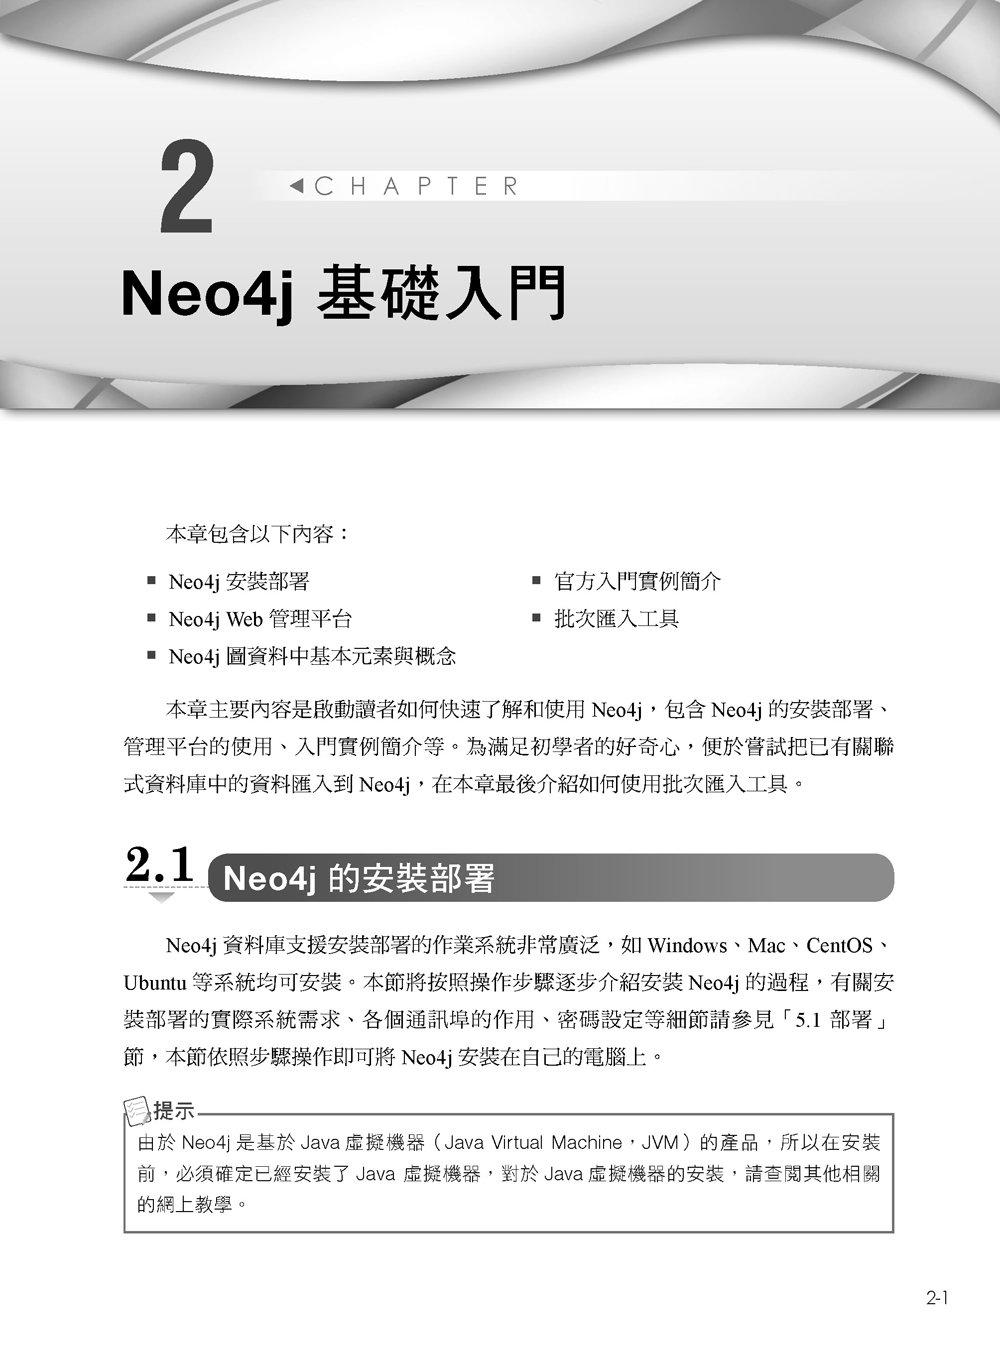 Neo4j 大事典 : 圖形資料庫 & 大數據時代-preview-13